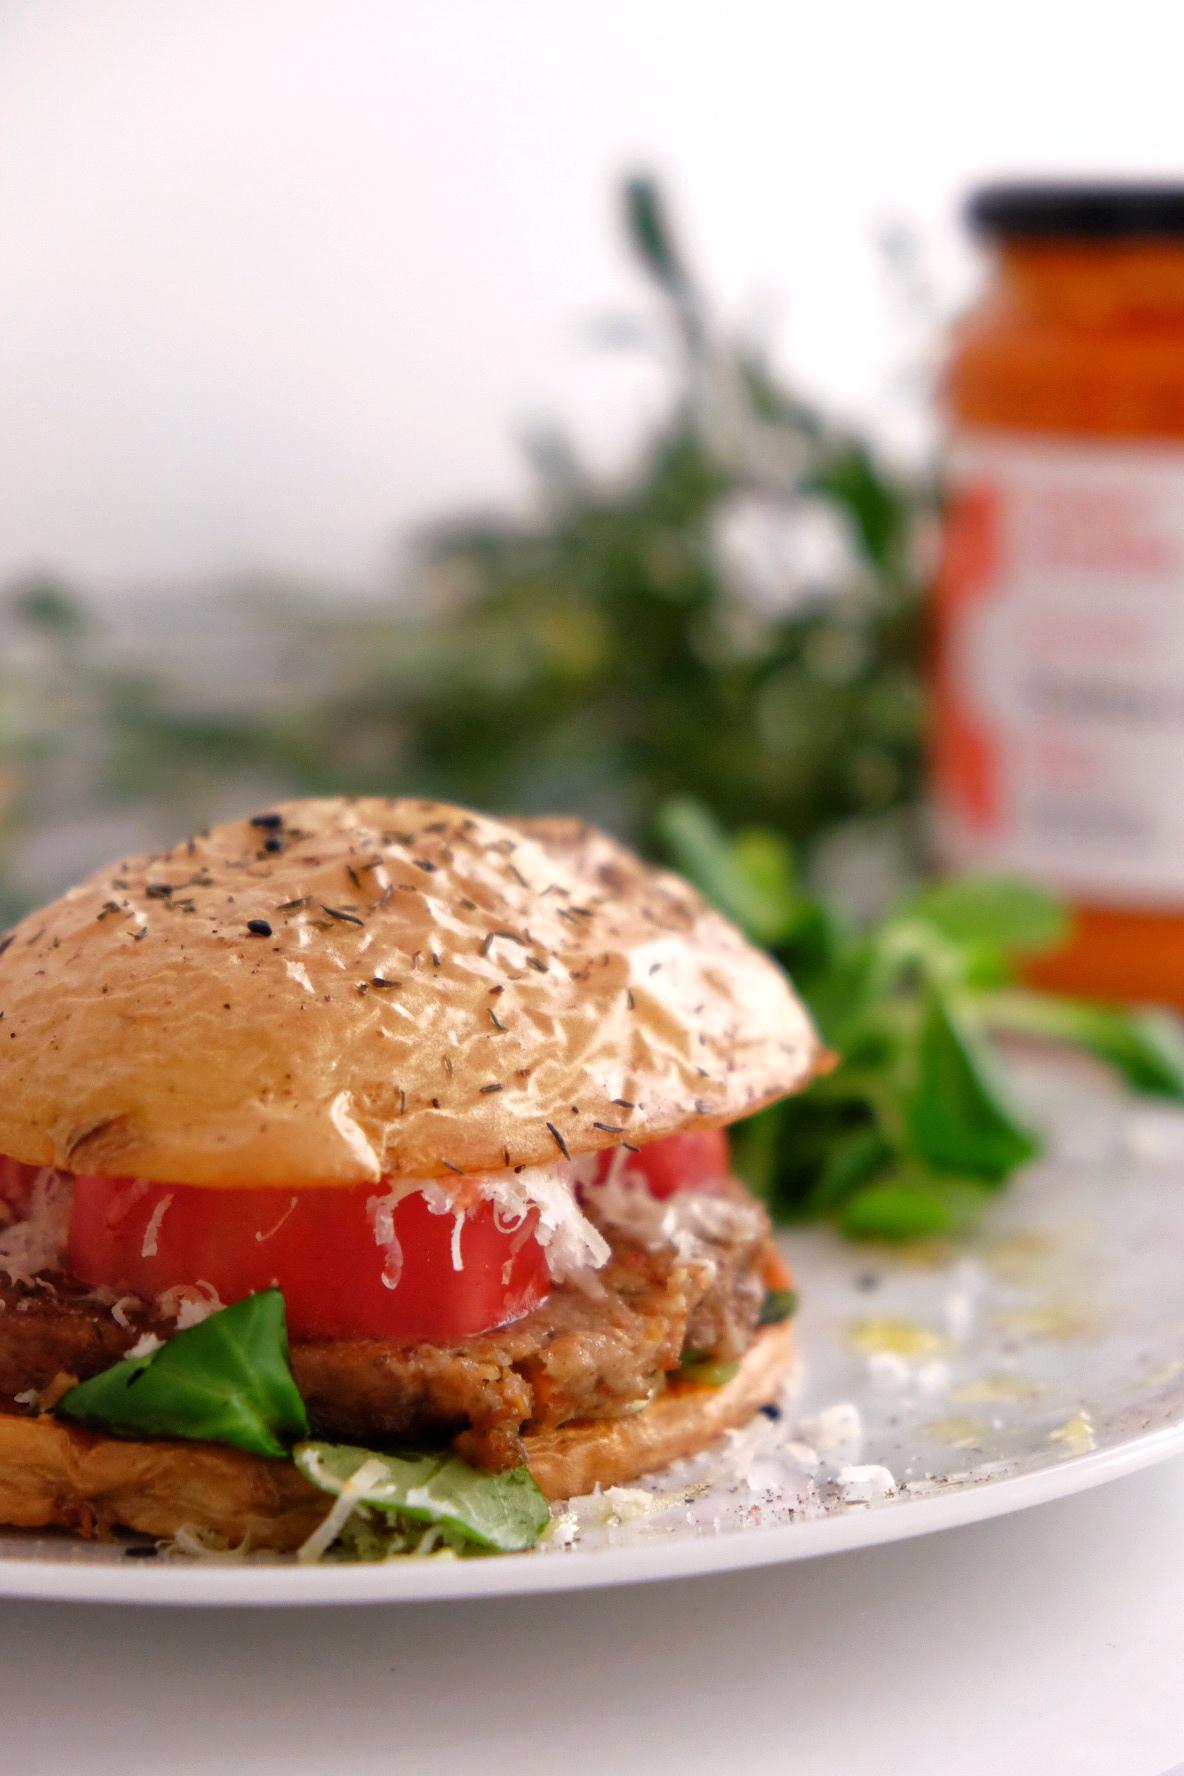 Burger vegetariana sin pan